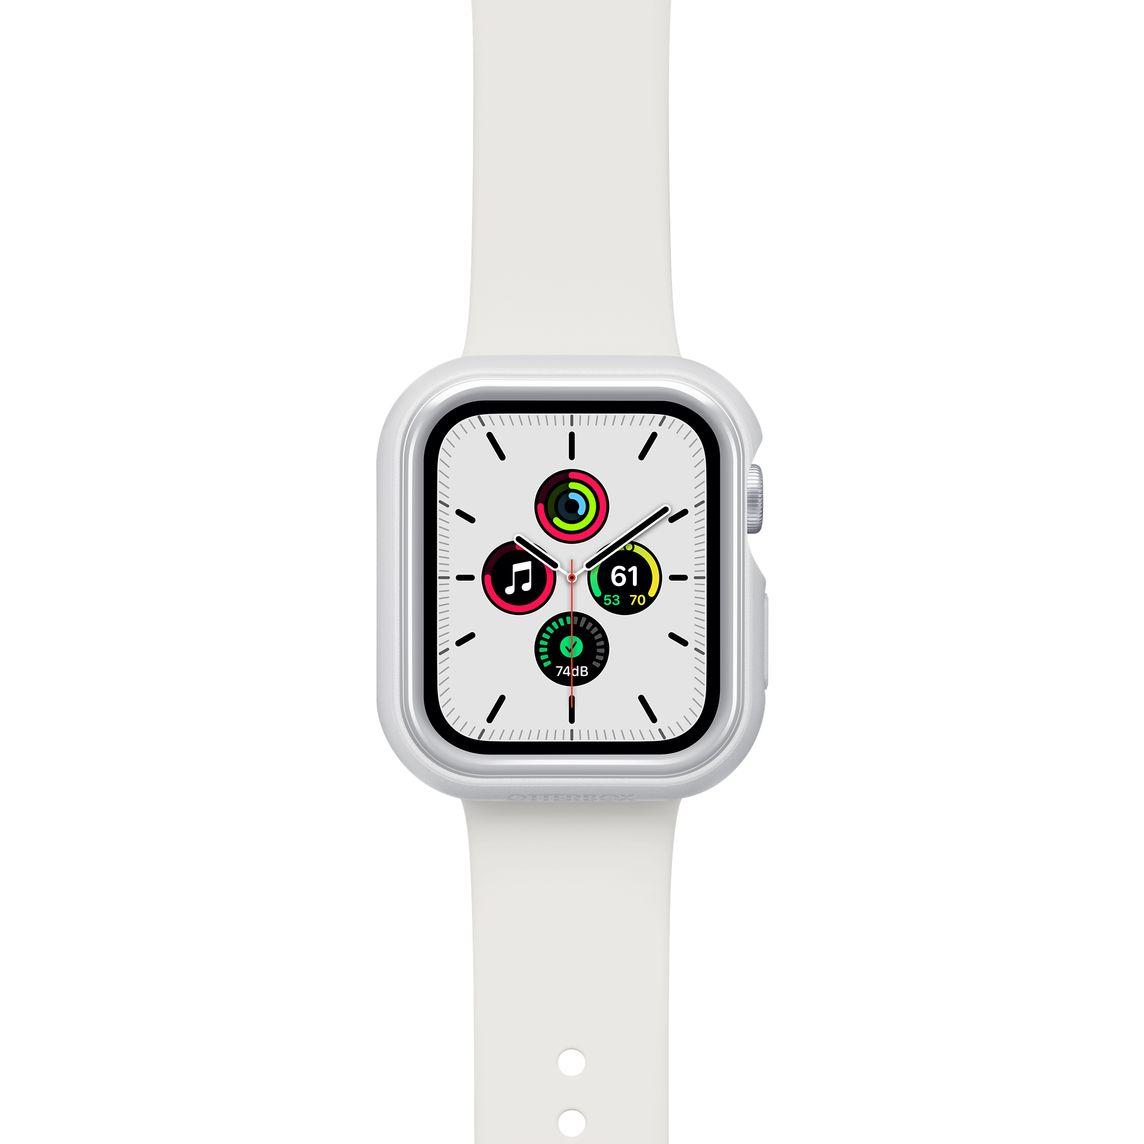 Watch Accessories Apple (UK